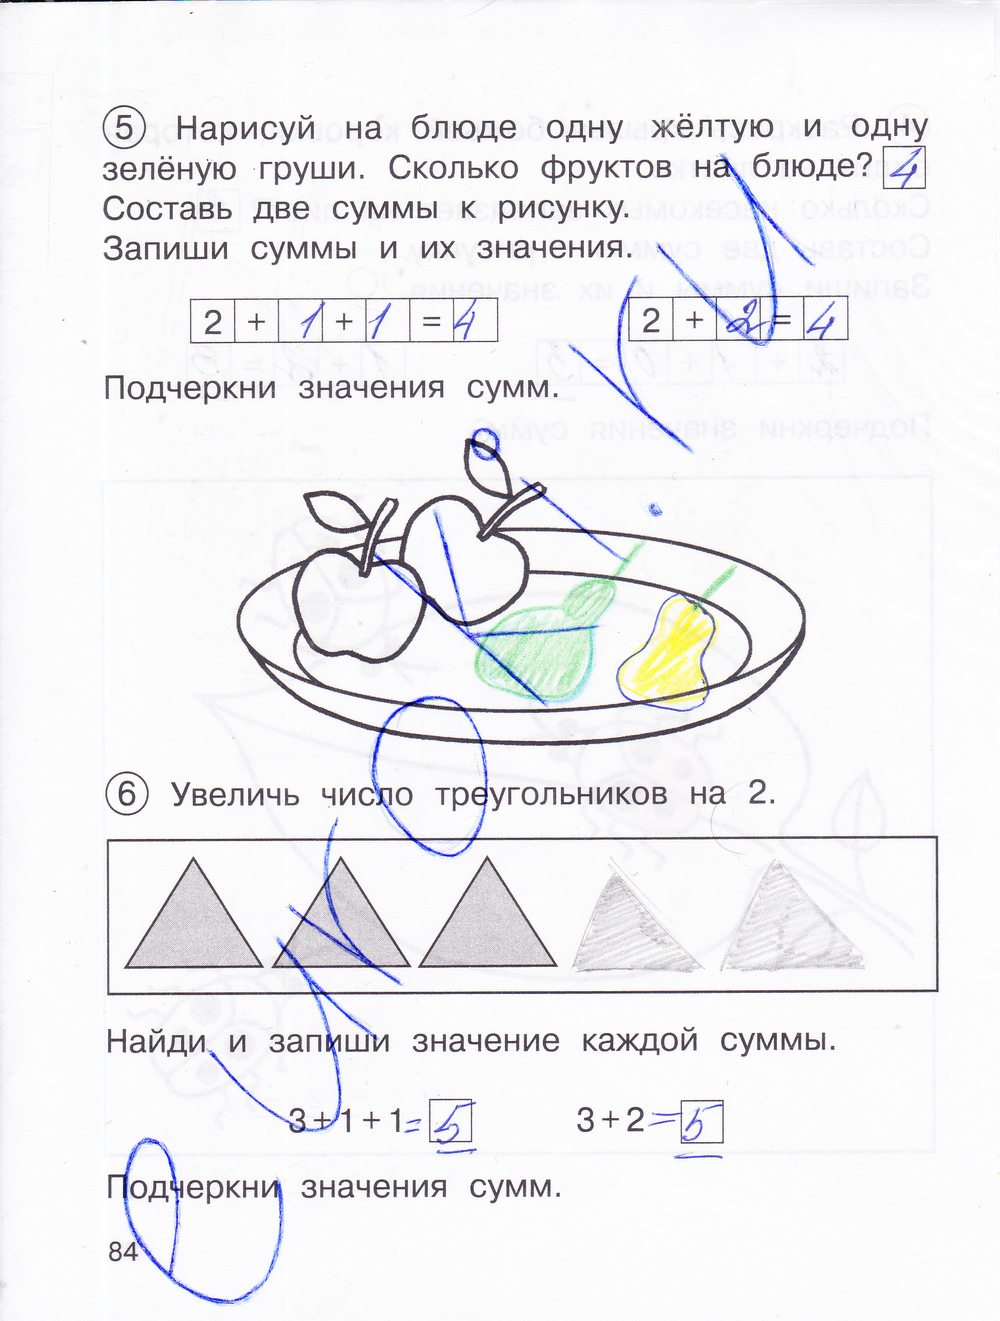 Решебник по математике 1 класс захарова юдина тетрадь 2